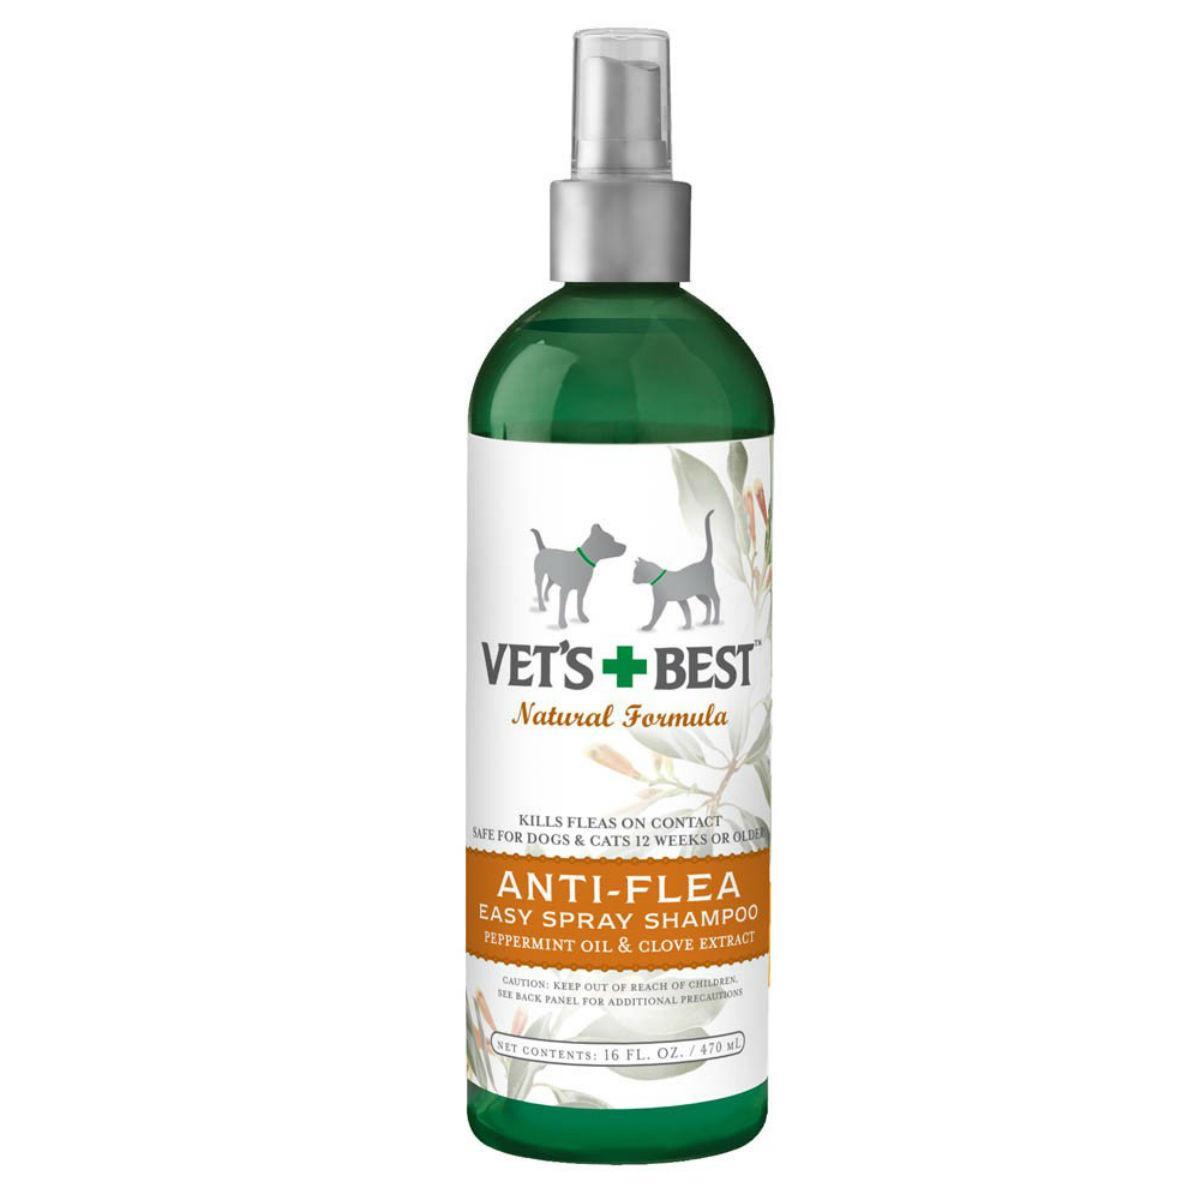 Vet's Best Natural Anti-Flea Easy Spray Dog and Cat Shampoo